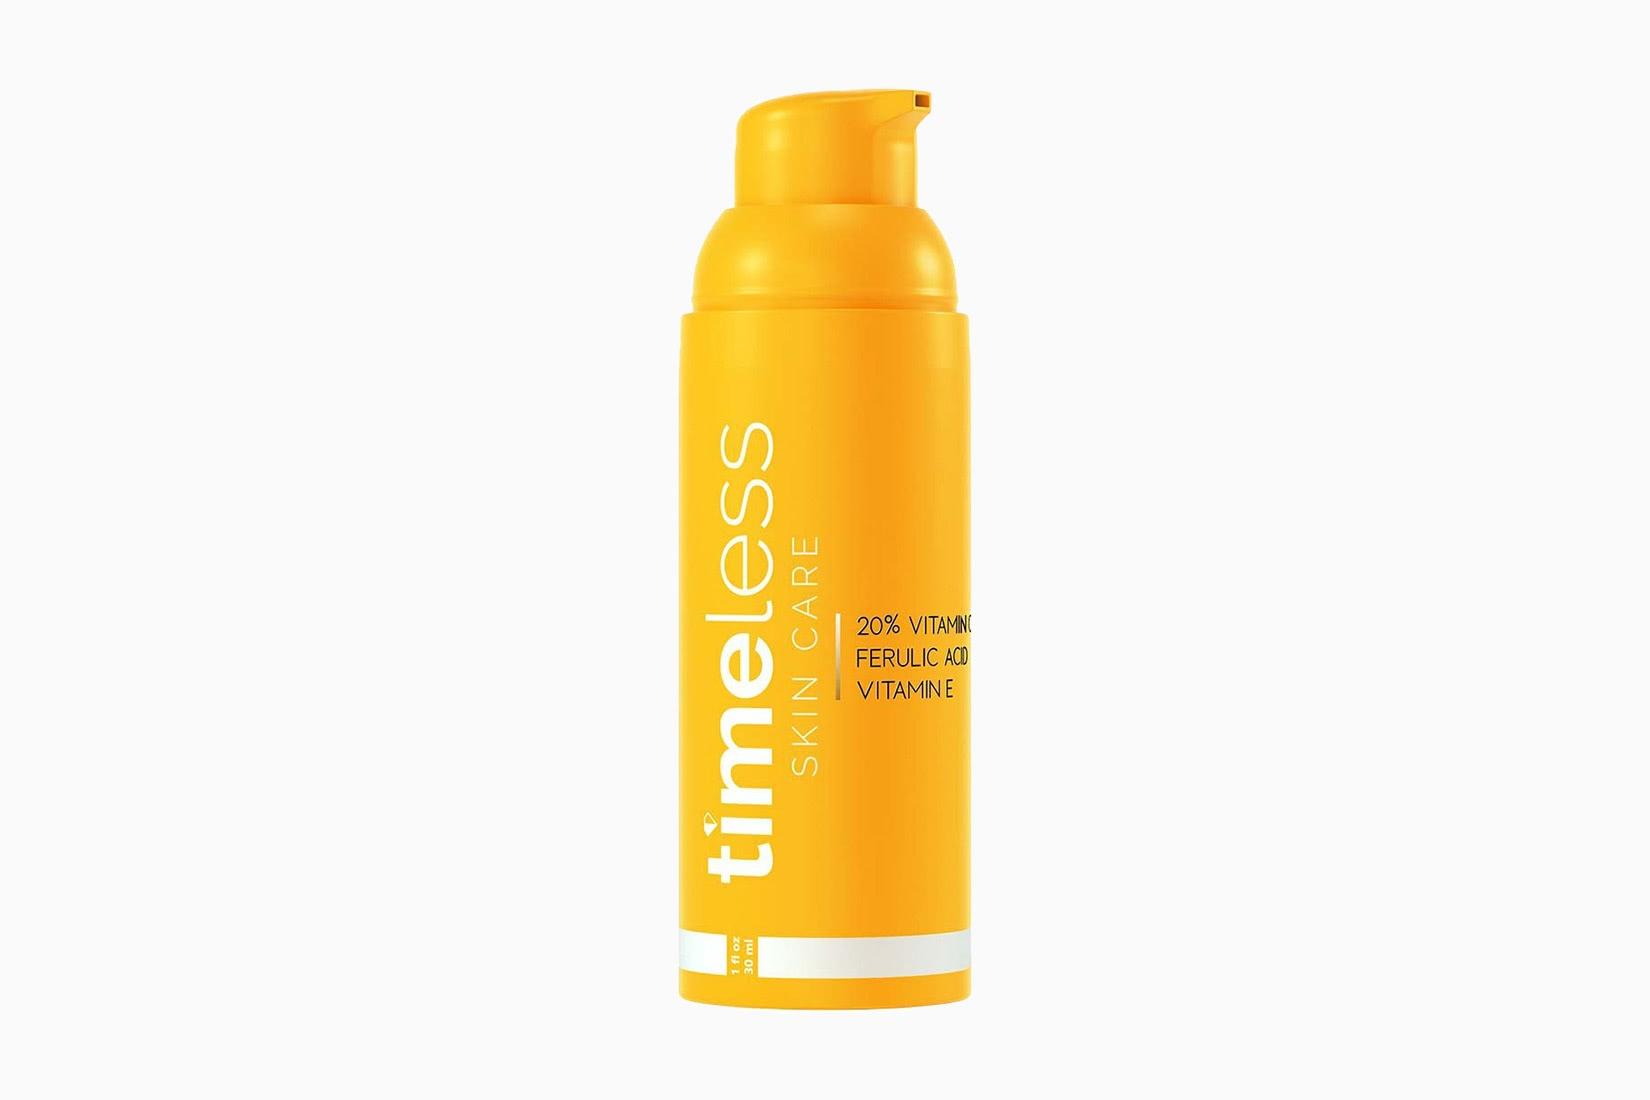 best natural organic beauty skincare timeless skin care vitamin c e ferulic acid serum - Luxe Digital